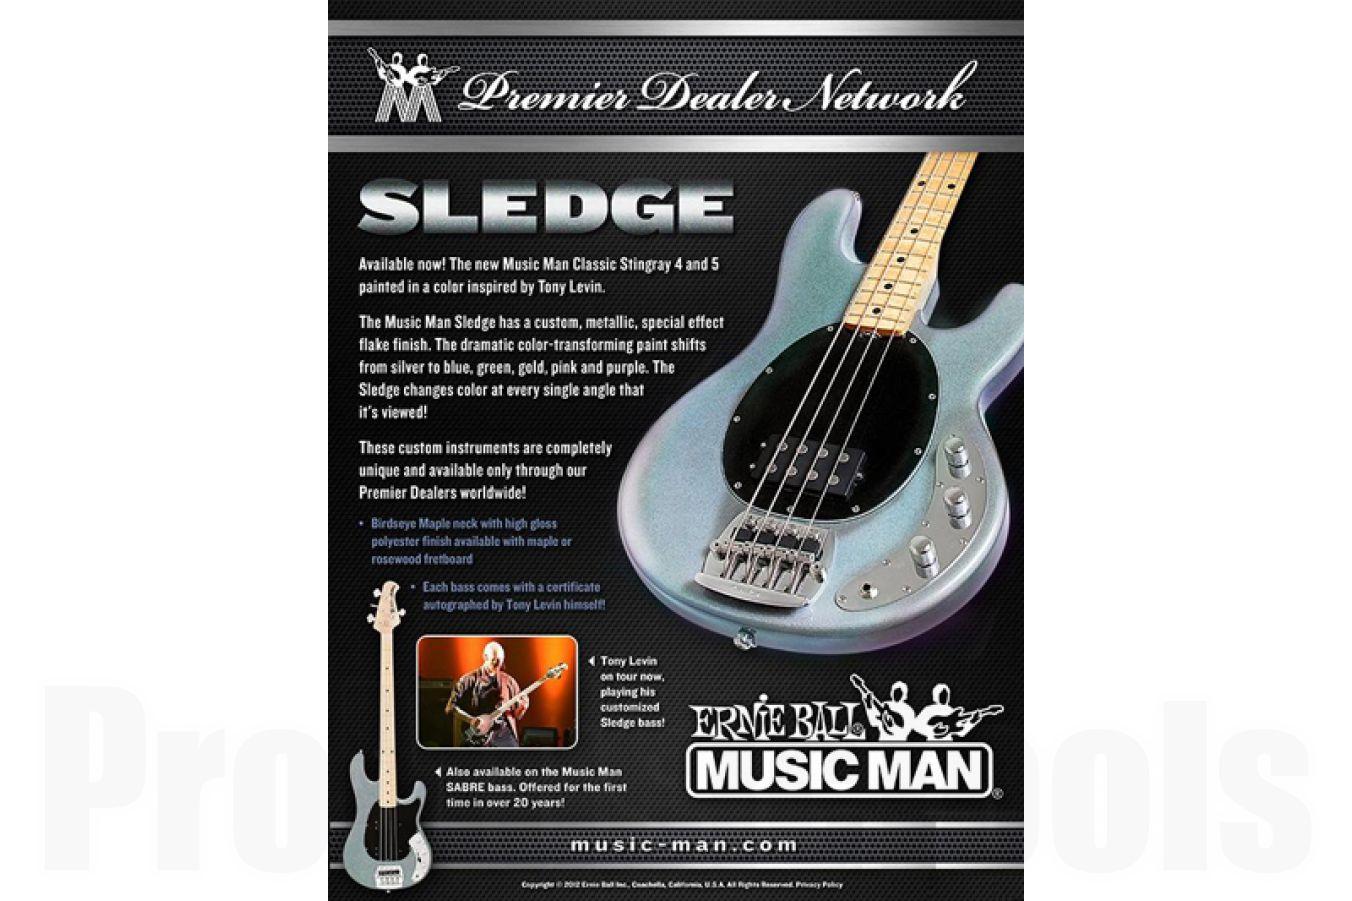 Music Man USA Classic Sabre 4 SL - PDN Sledge Limited Edition RW